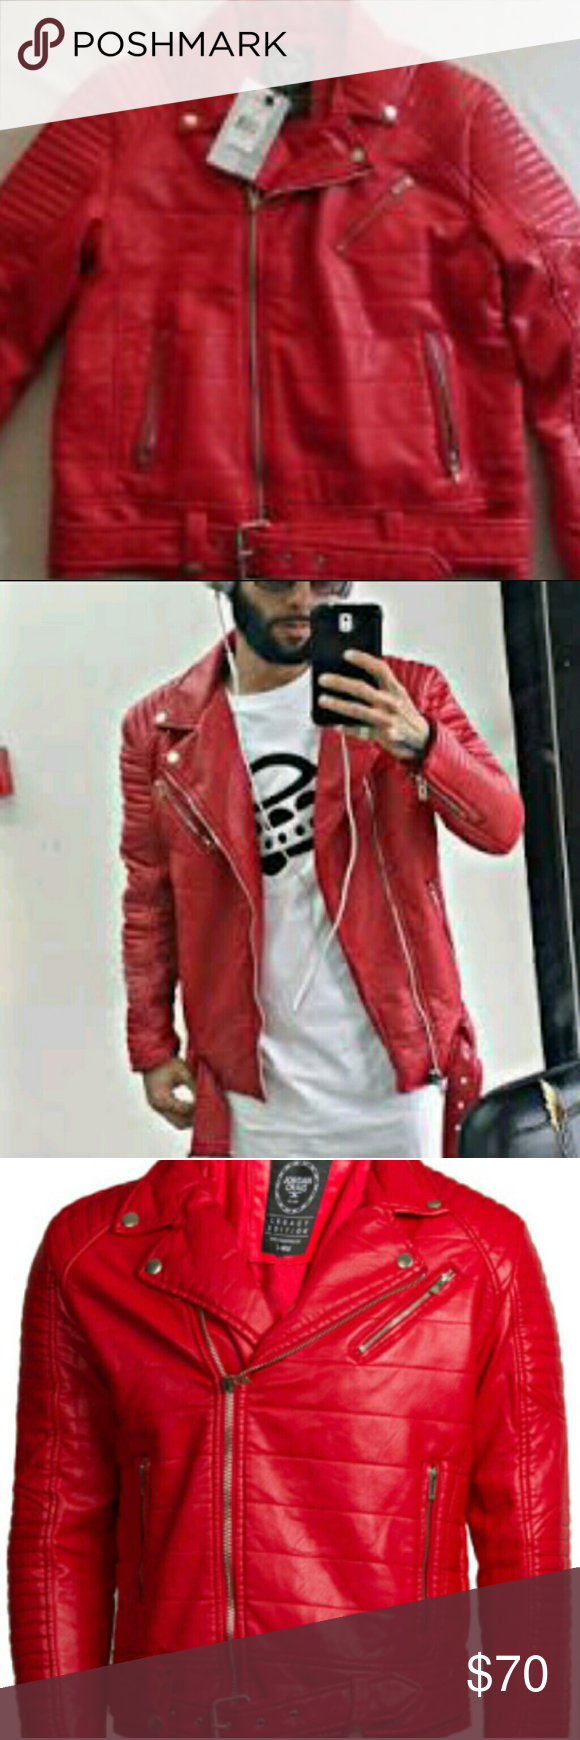 3537eaa6542d4c Red leather Jordan Craig jacket still has tags. Available for trade Jordan  Craig Jackets   Coats